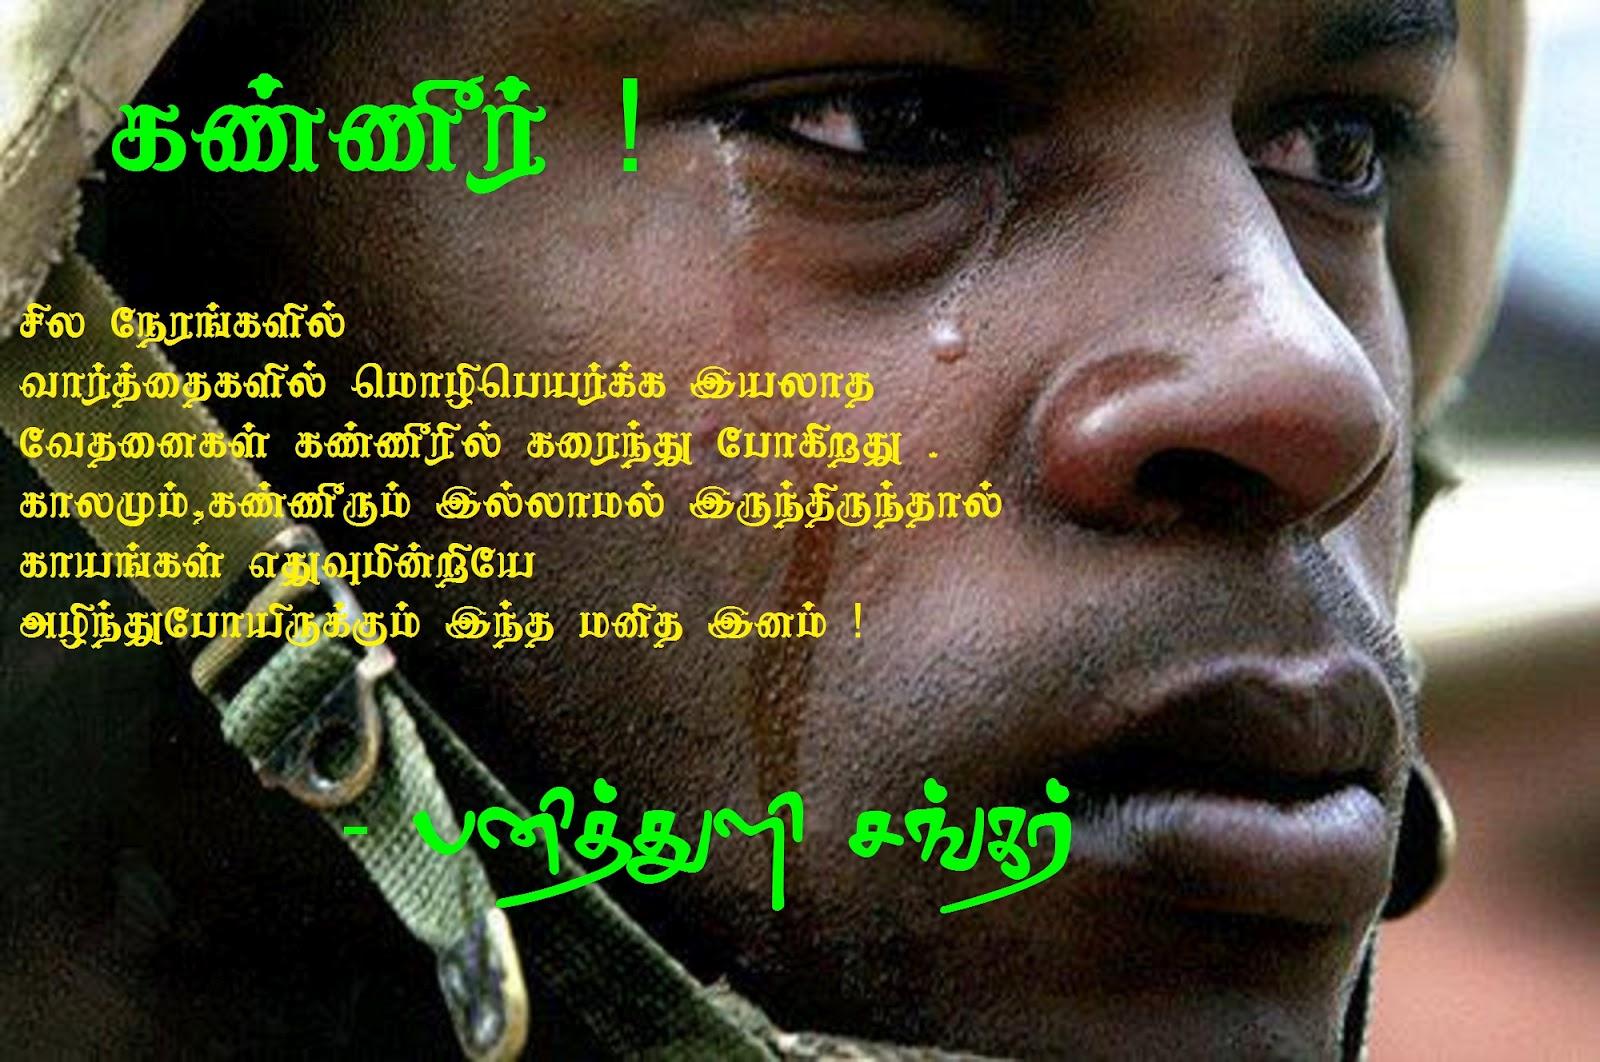 Tamil Appa Magal - seotoolnet.com